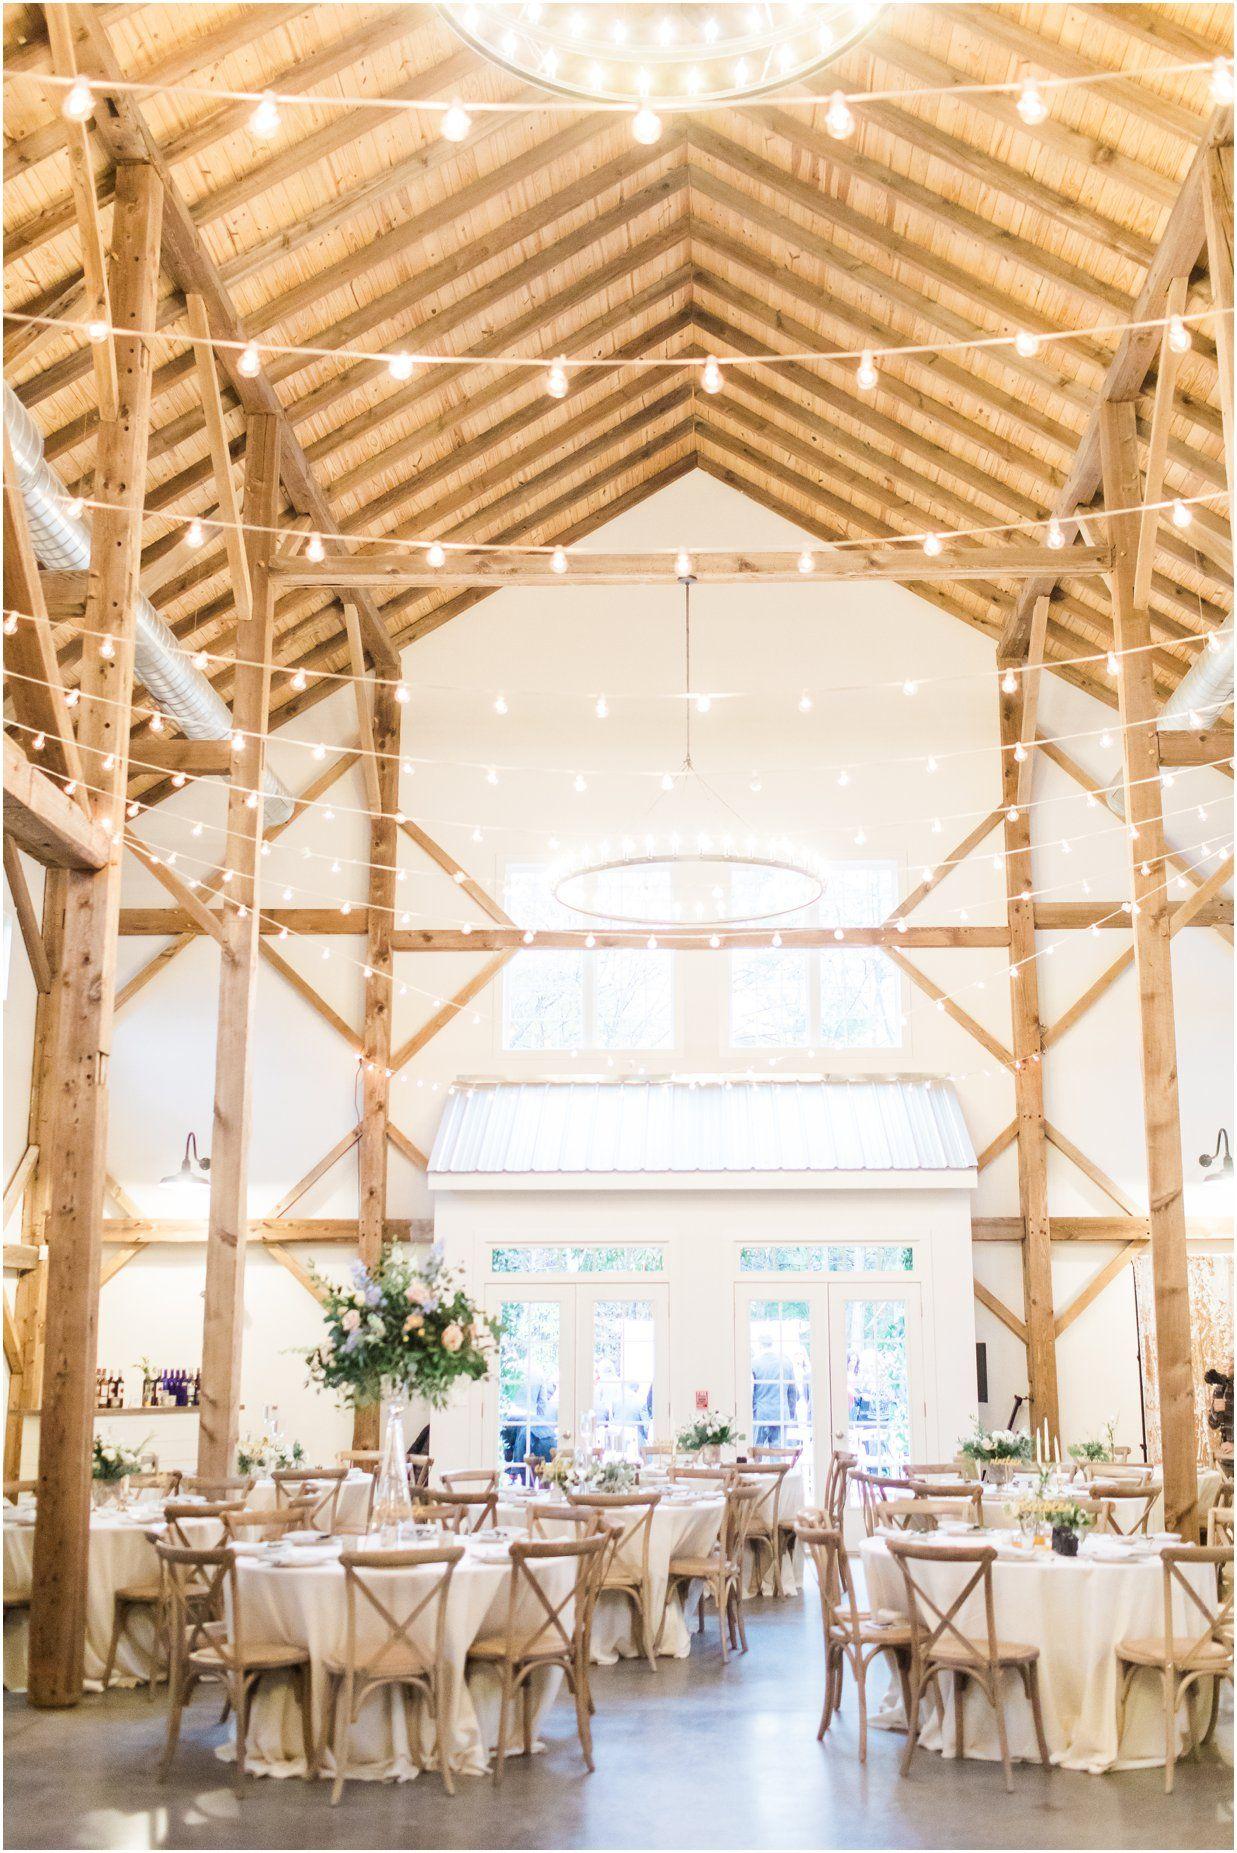 The Barn of Chapel Hill Barn wedding venue, Chapel hill